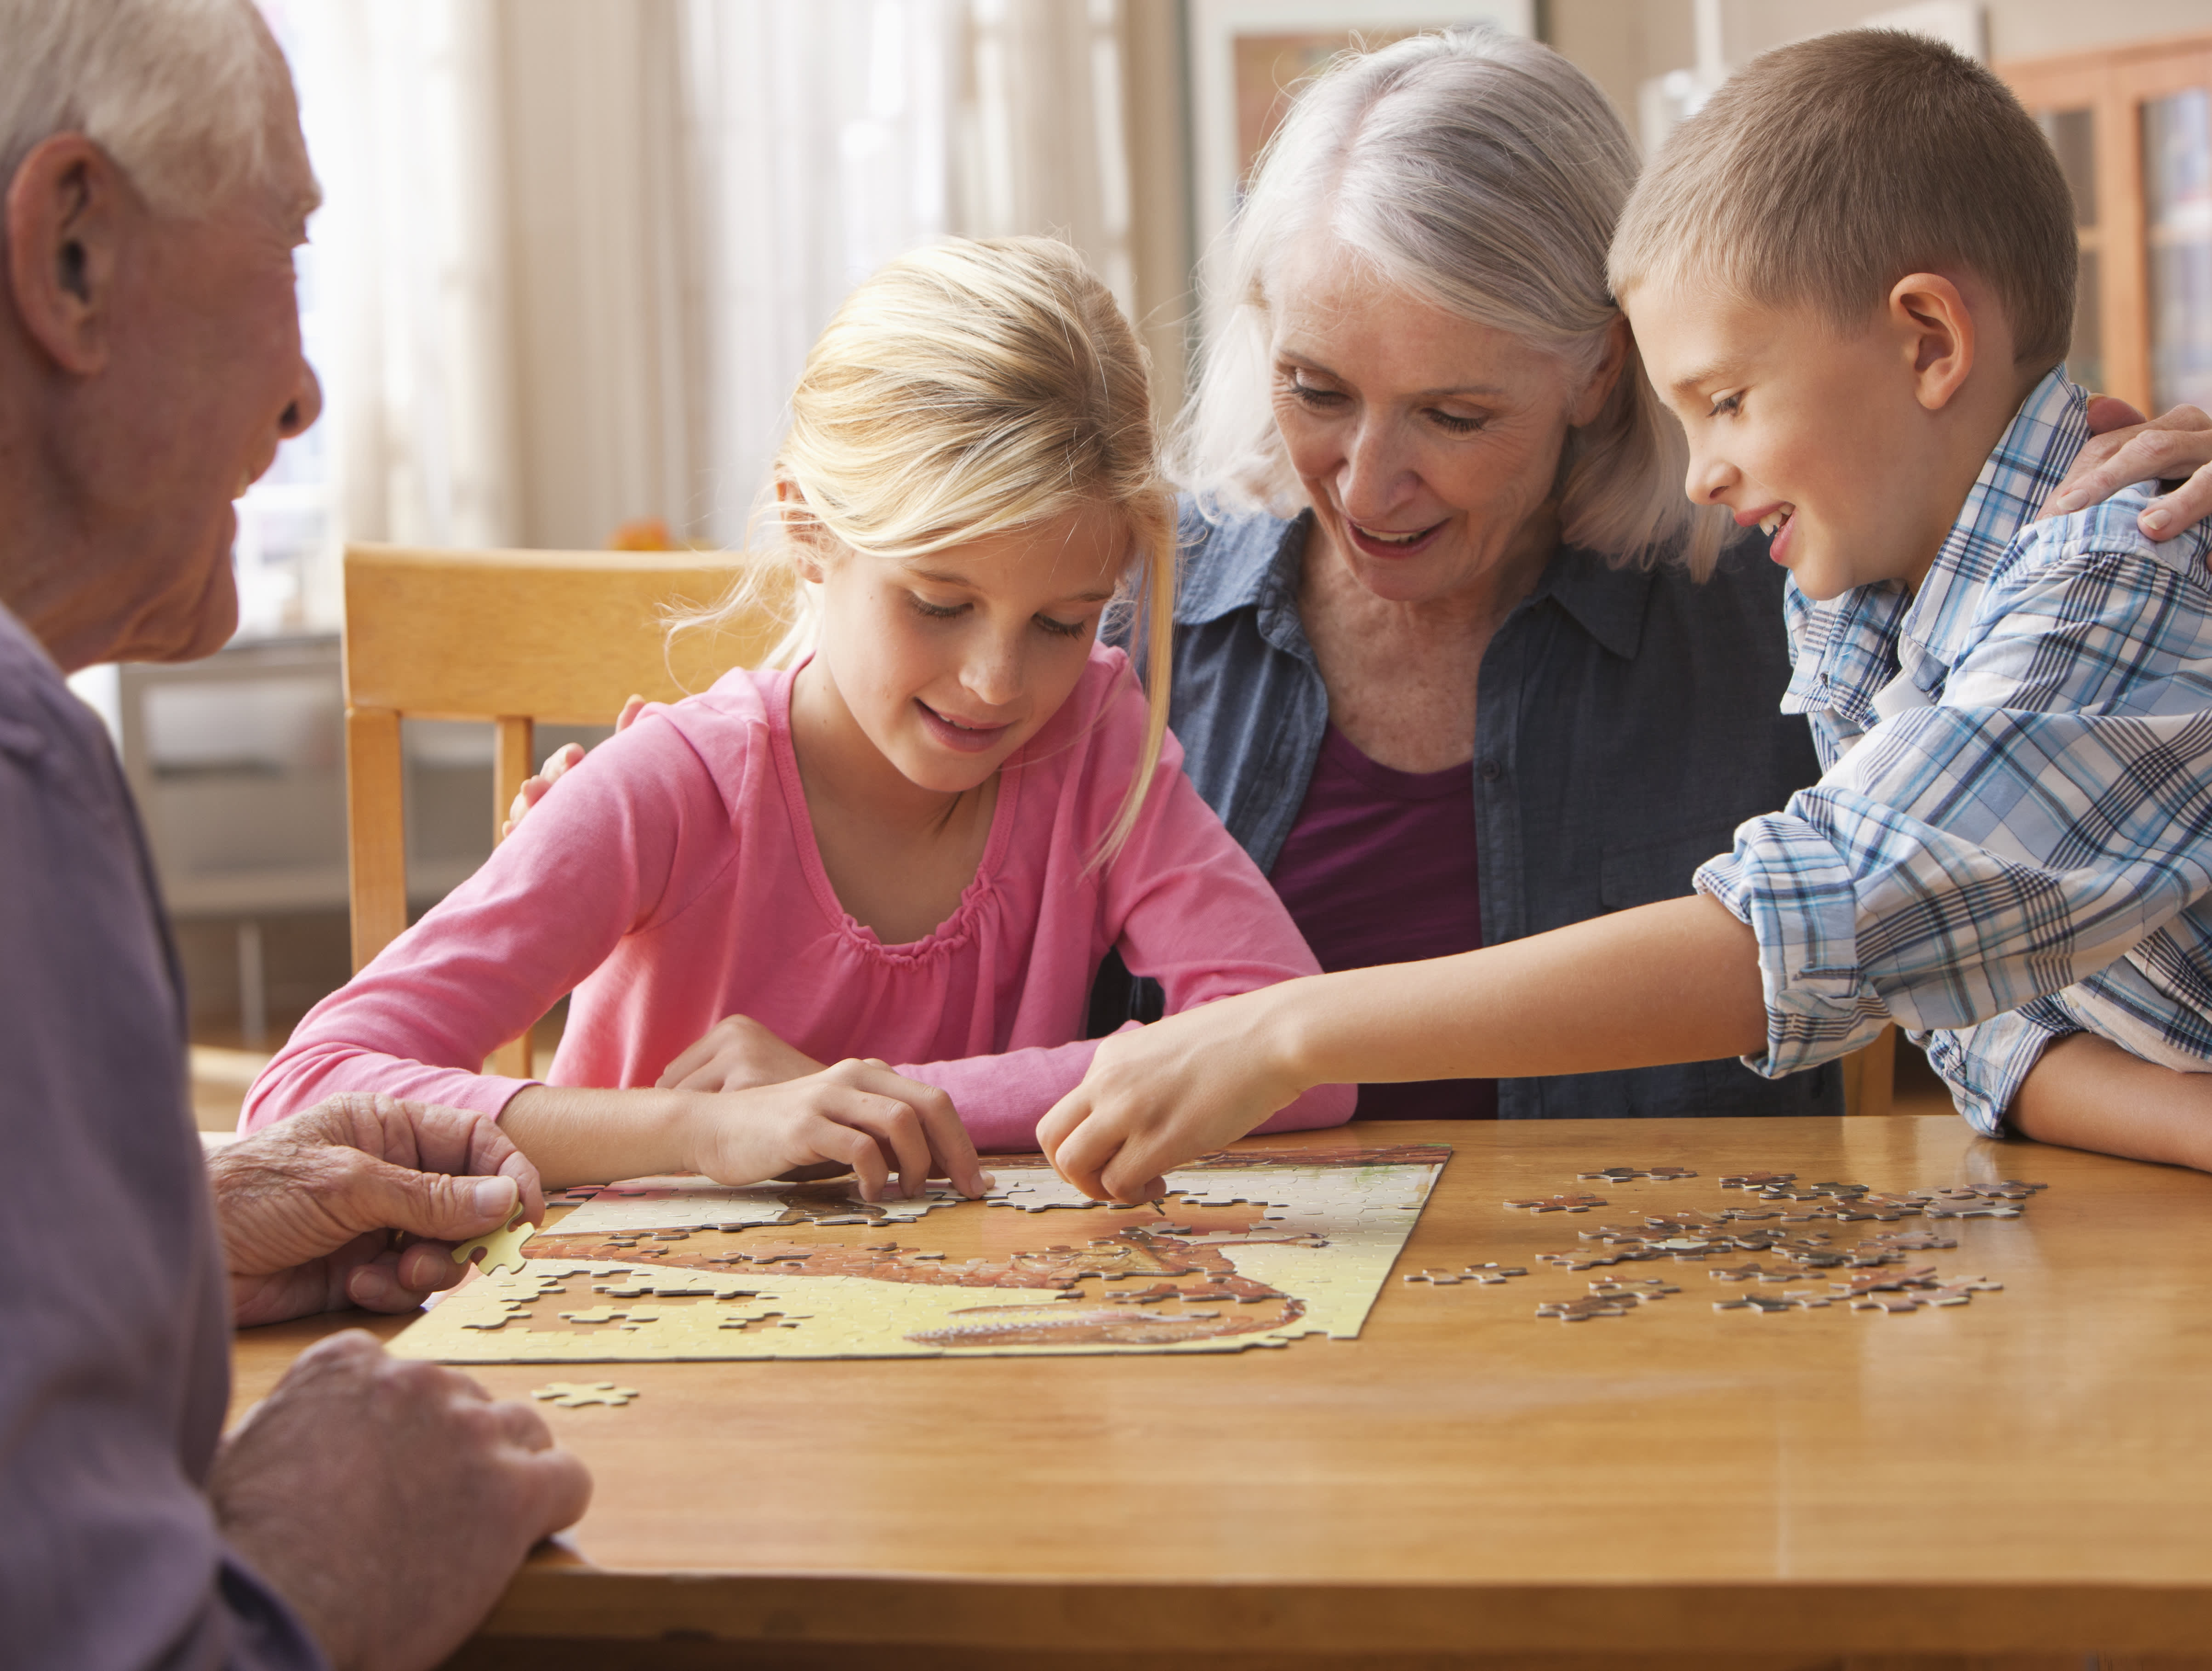 Coronavirus sends demand for jigsaw puzzles surging